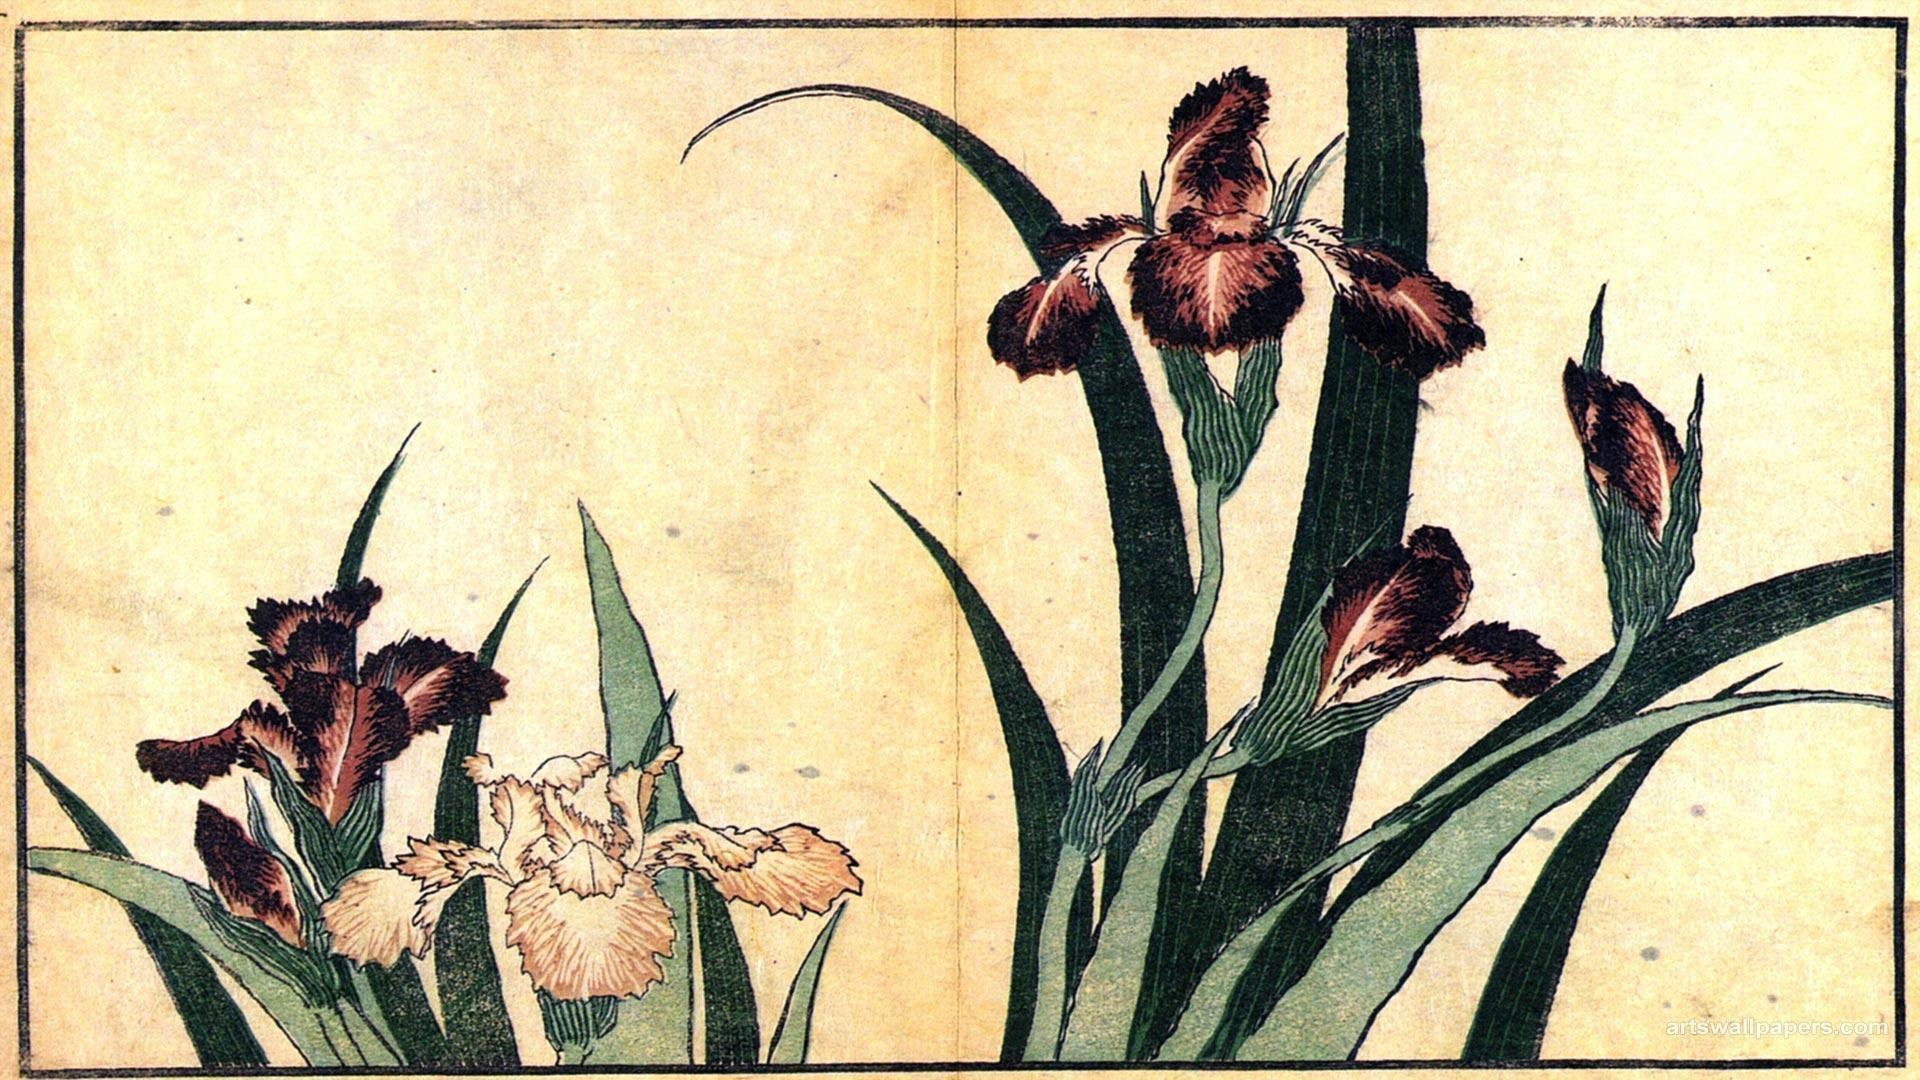 Hokusai Katsushika Ukiyo E Japanese Art Wallpaper | Wallpaper